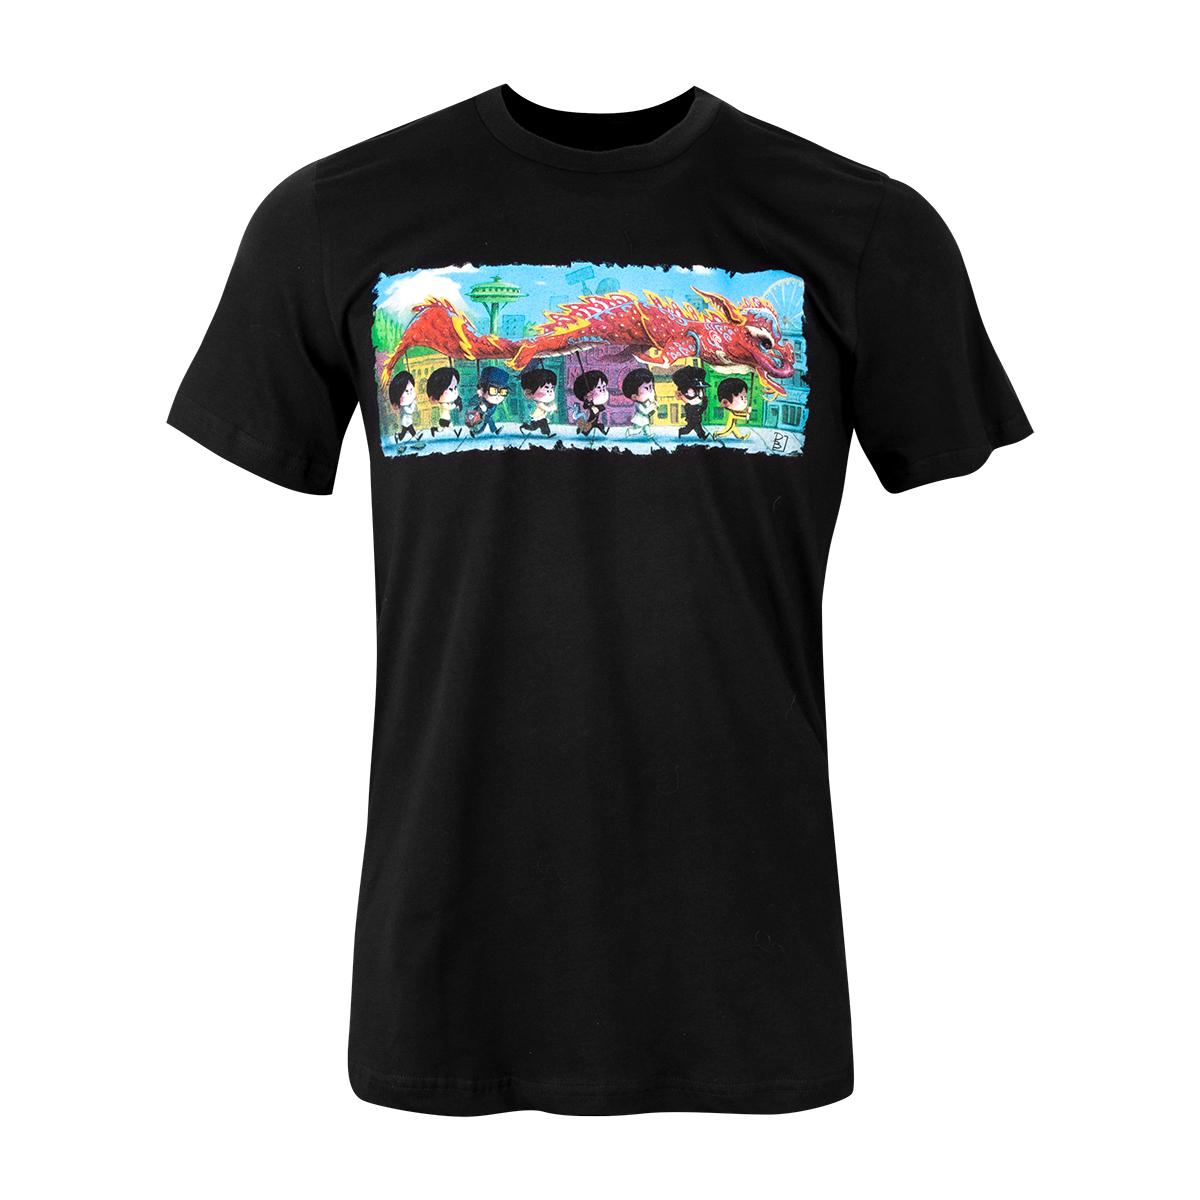 "ARTIST SERIES: ""The Dragon Dance"" T-shirt - Black"